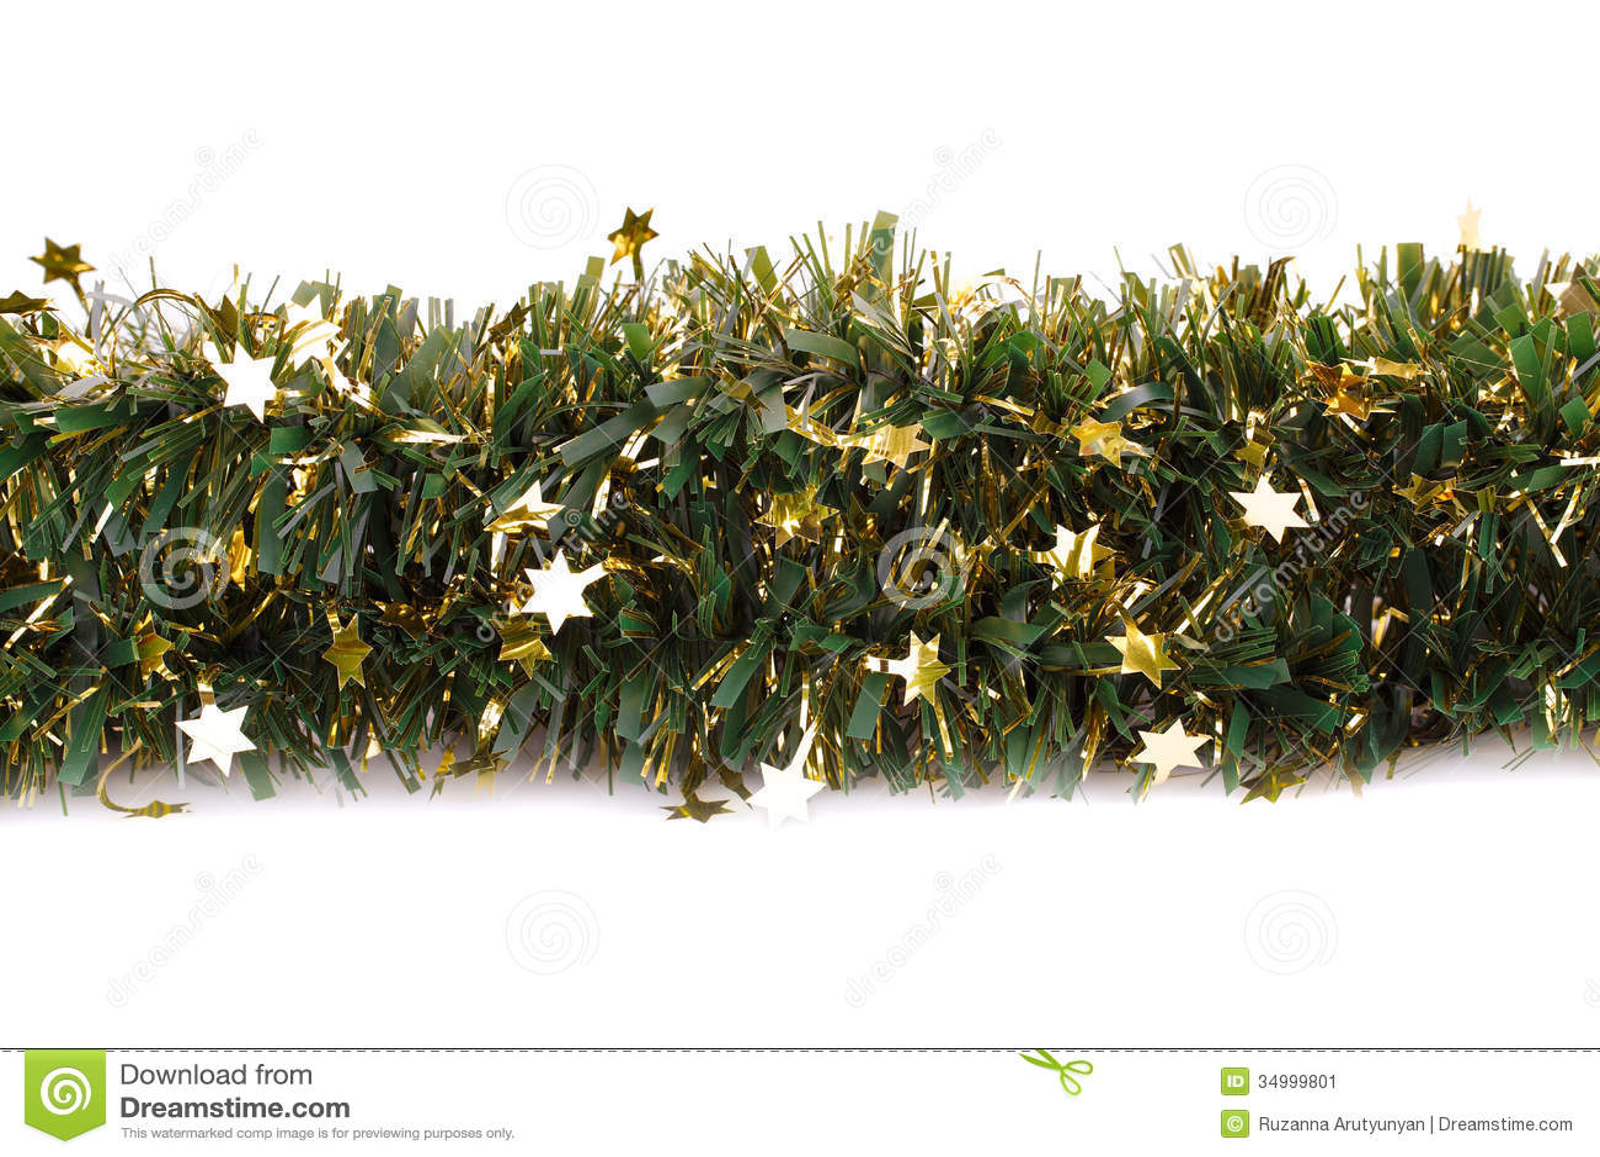 Christmas Garland Stock Image Image Of Green Merry